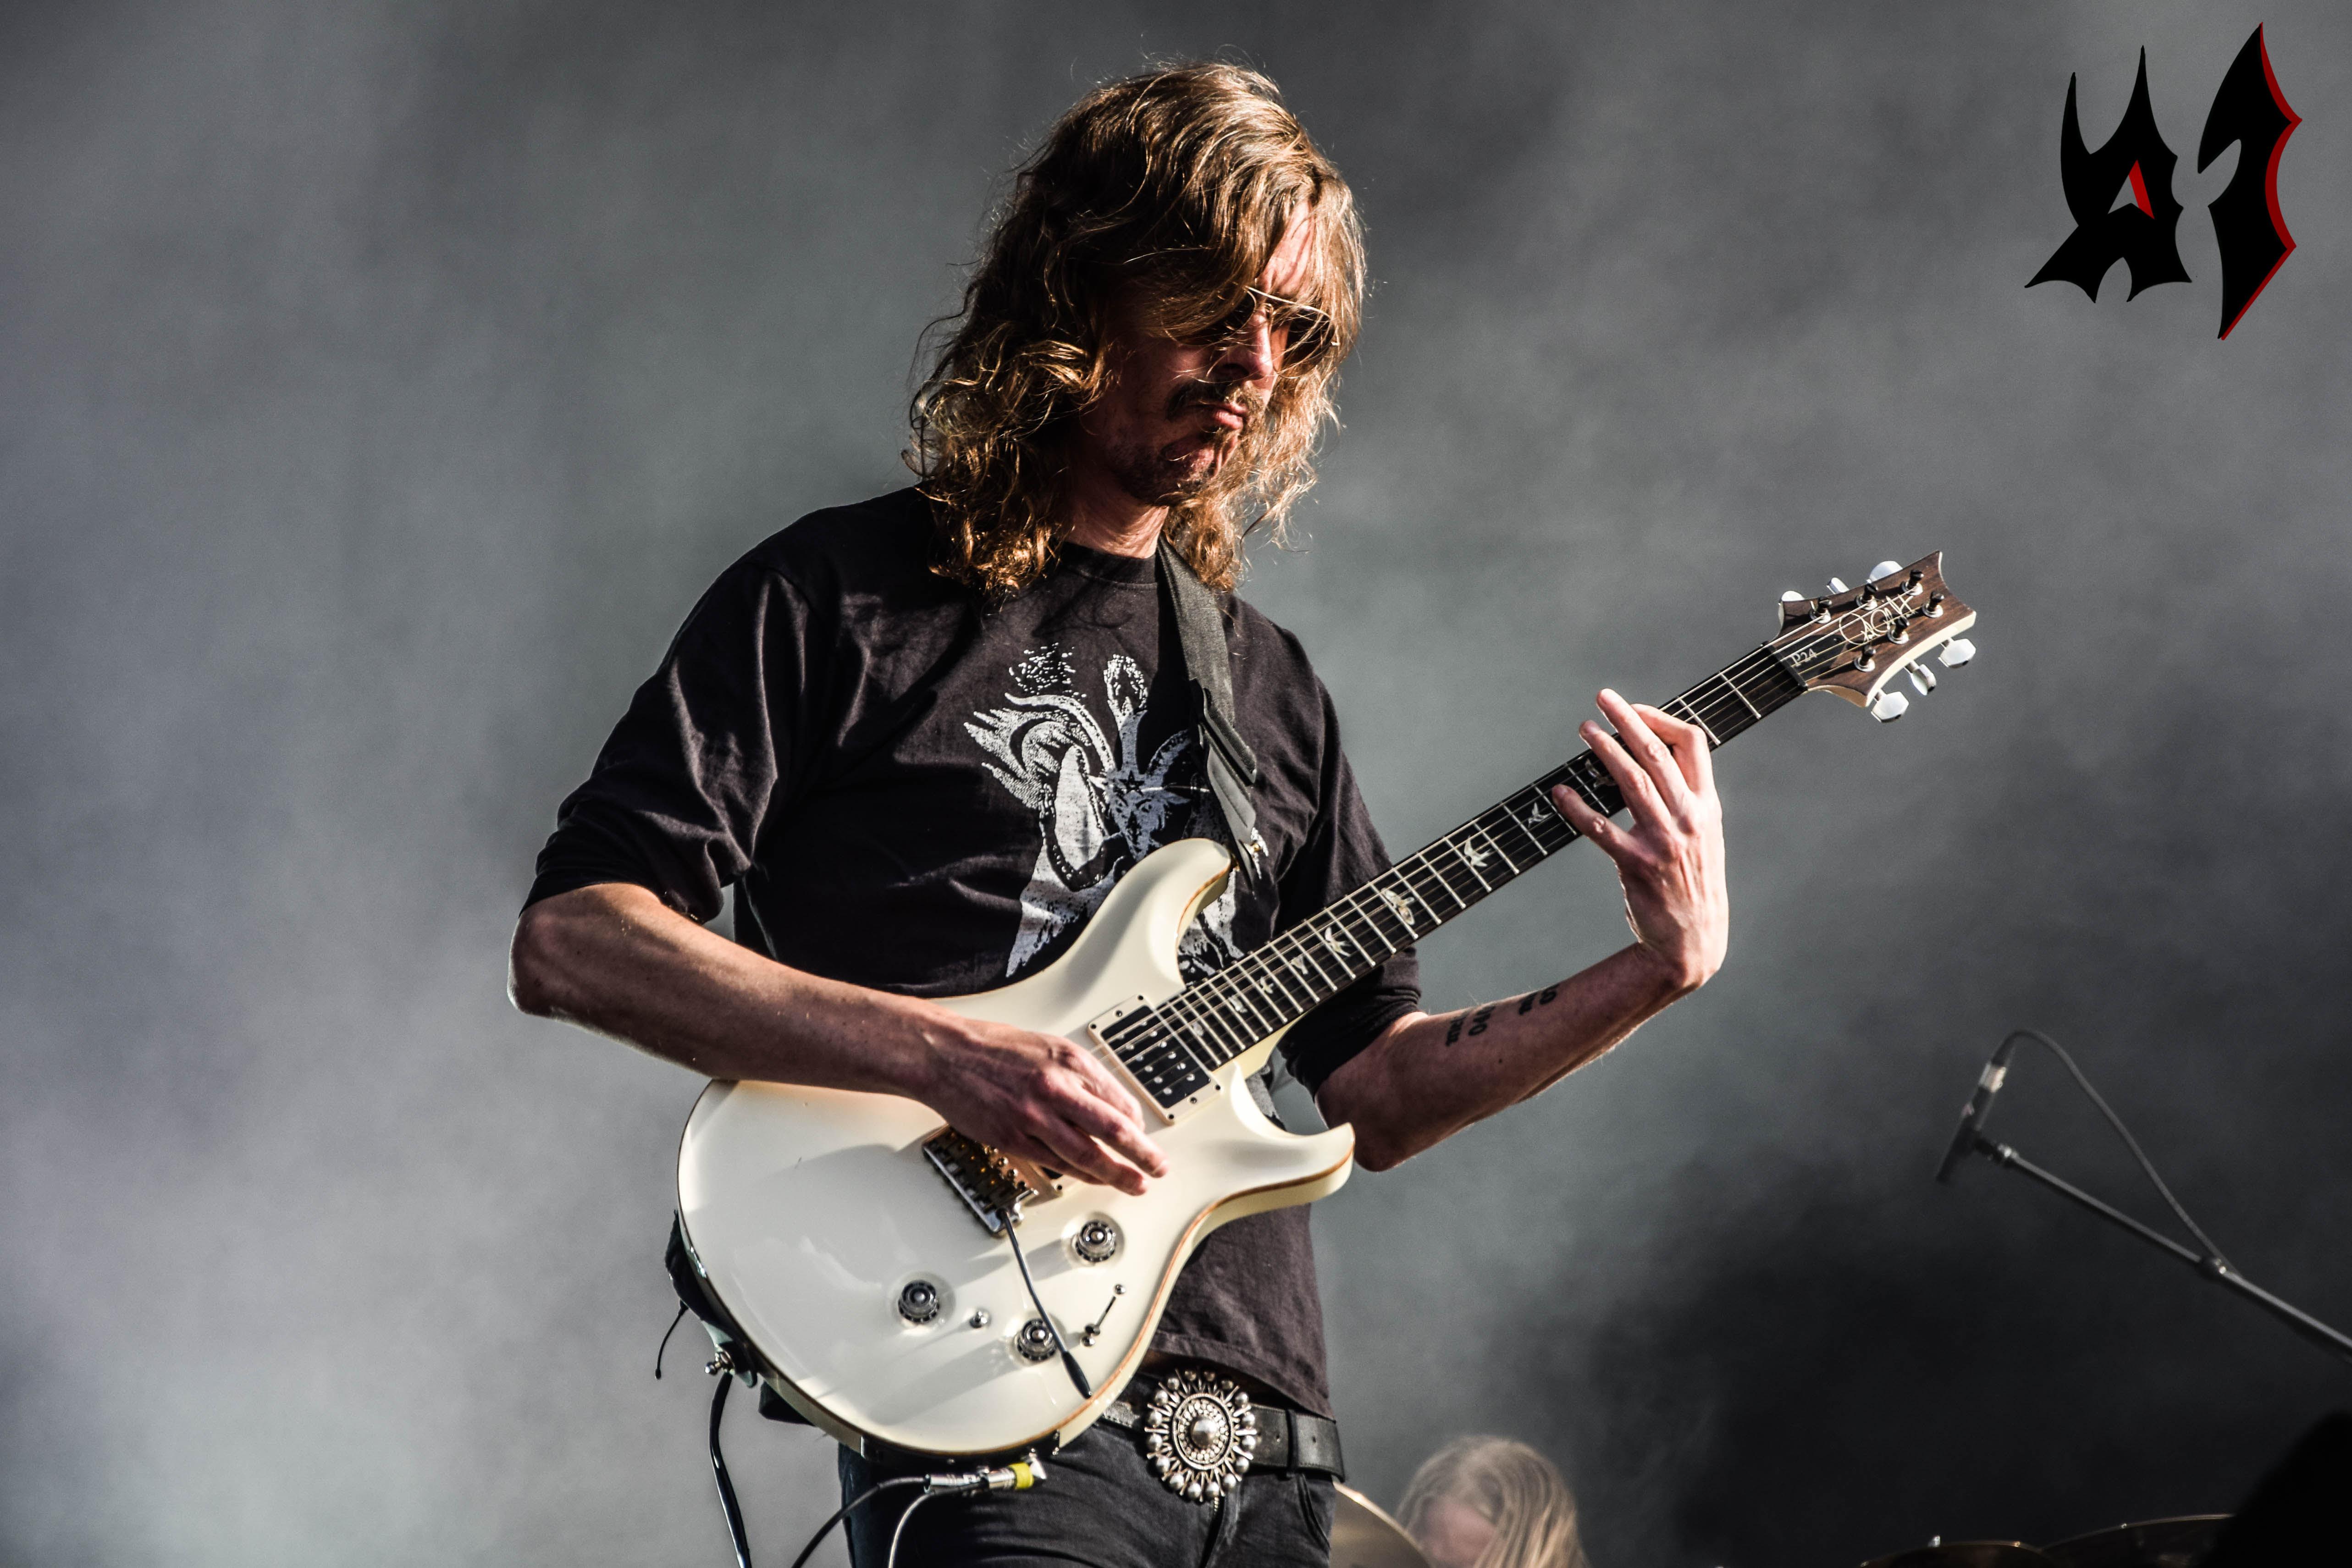 Donwload 2018 – Day 1 - Opeth 16